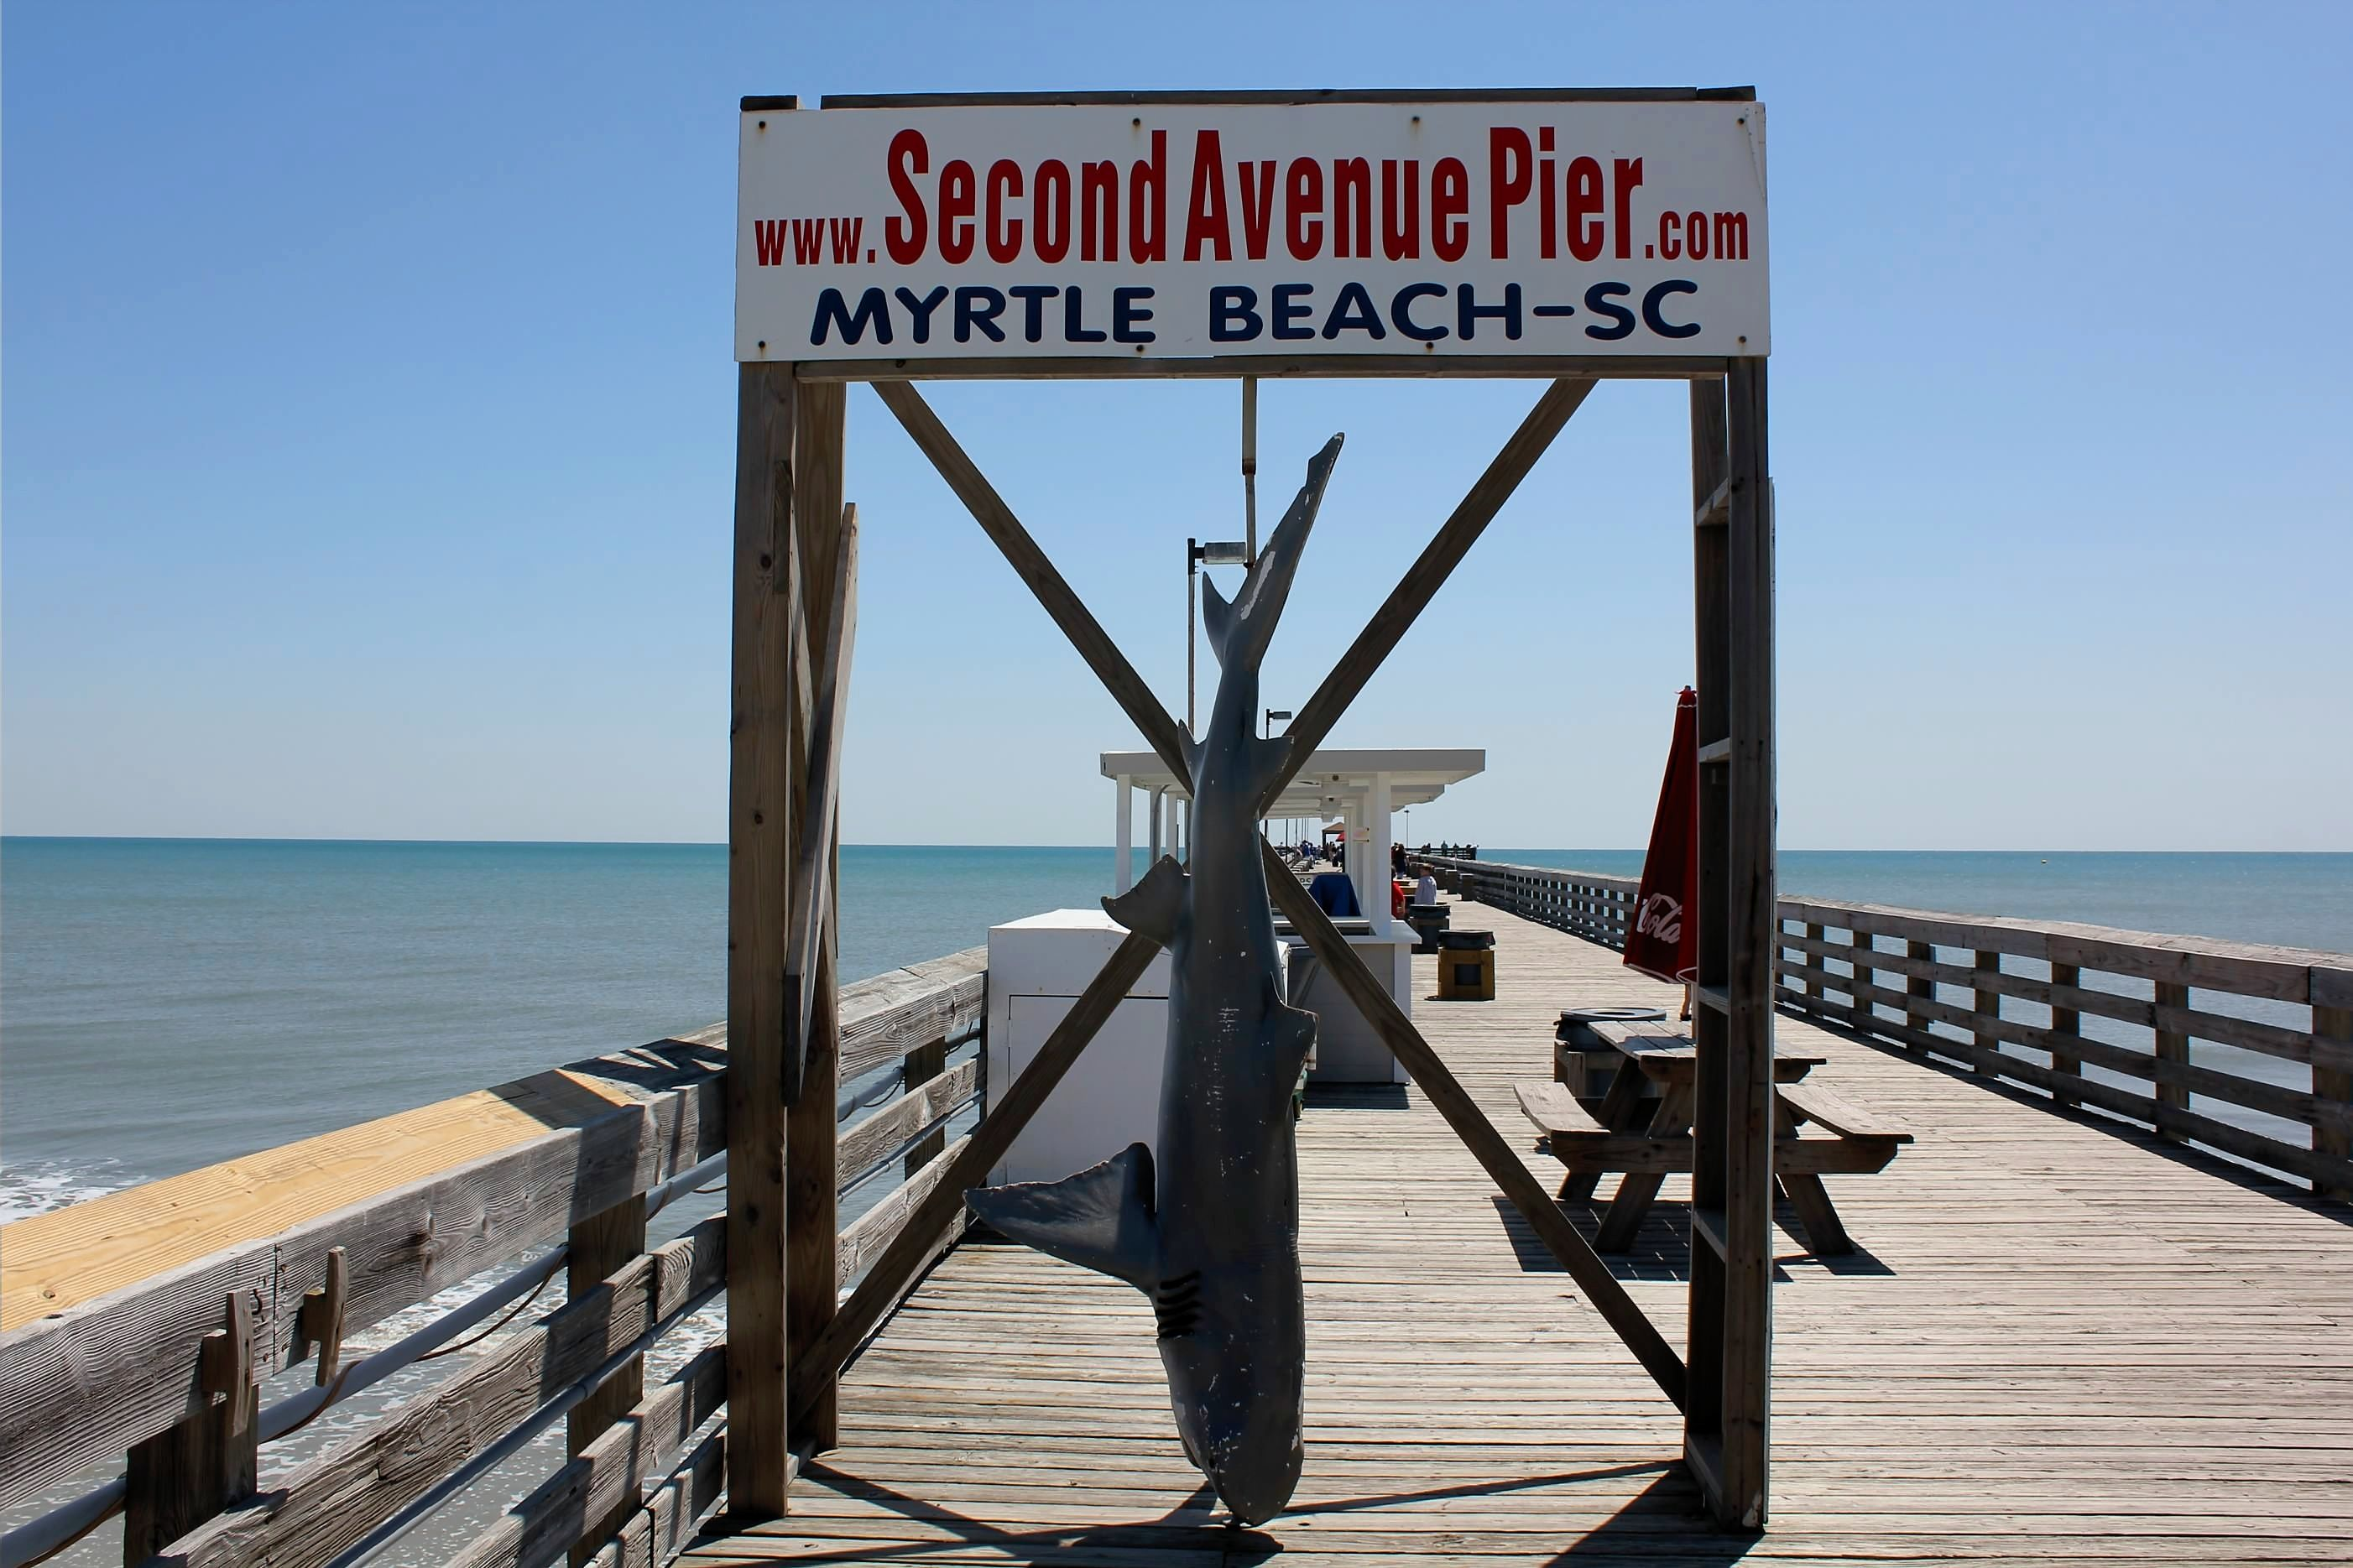 Second Ave Pier Myrtle Beach